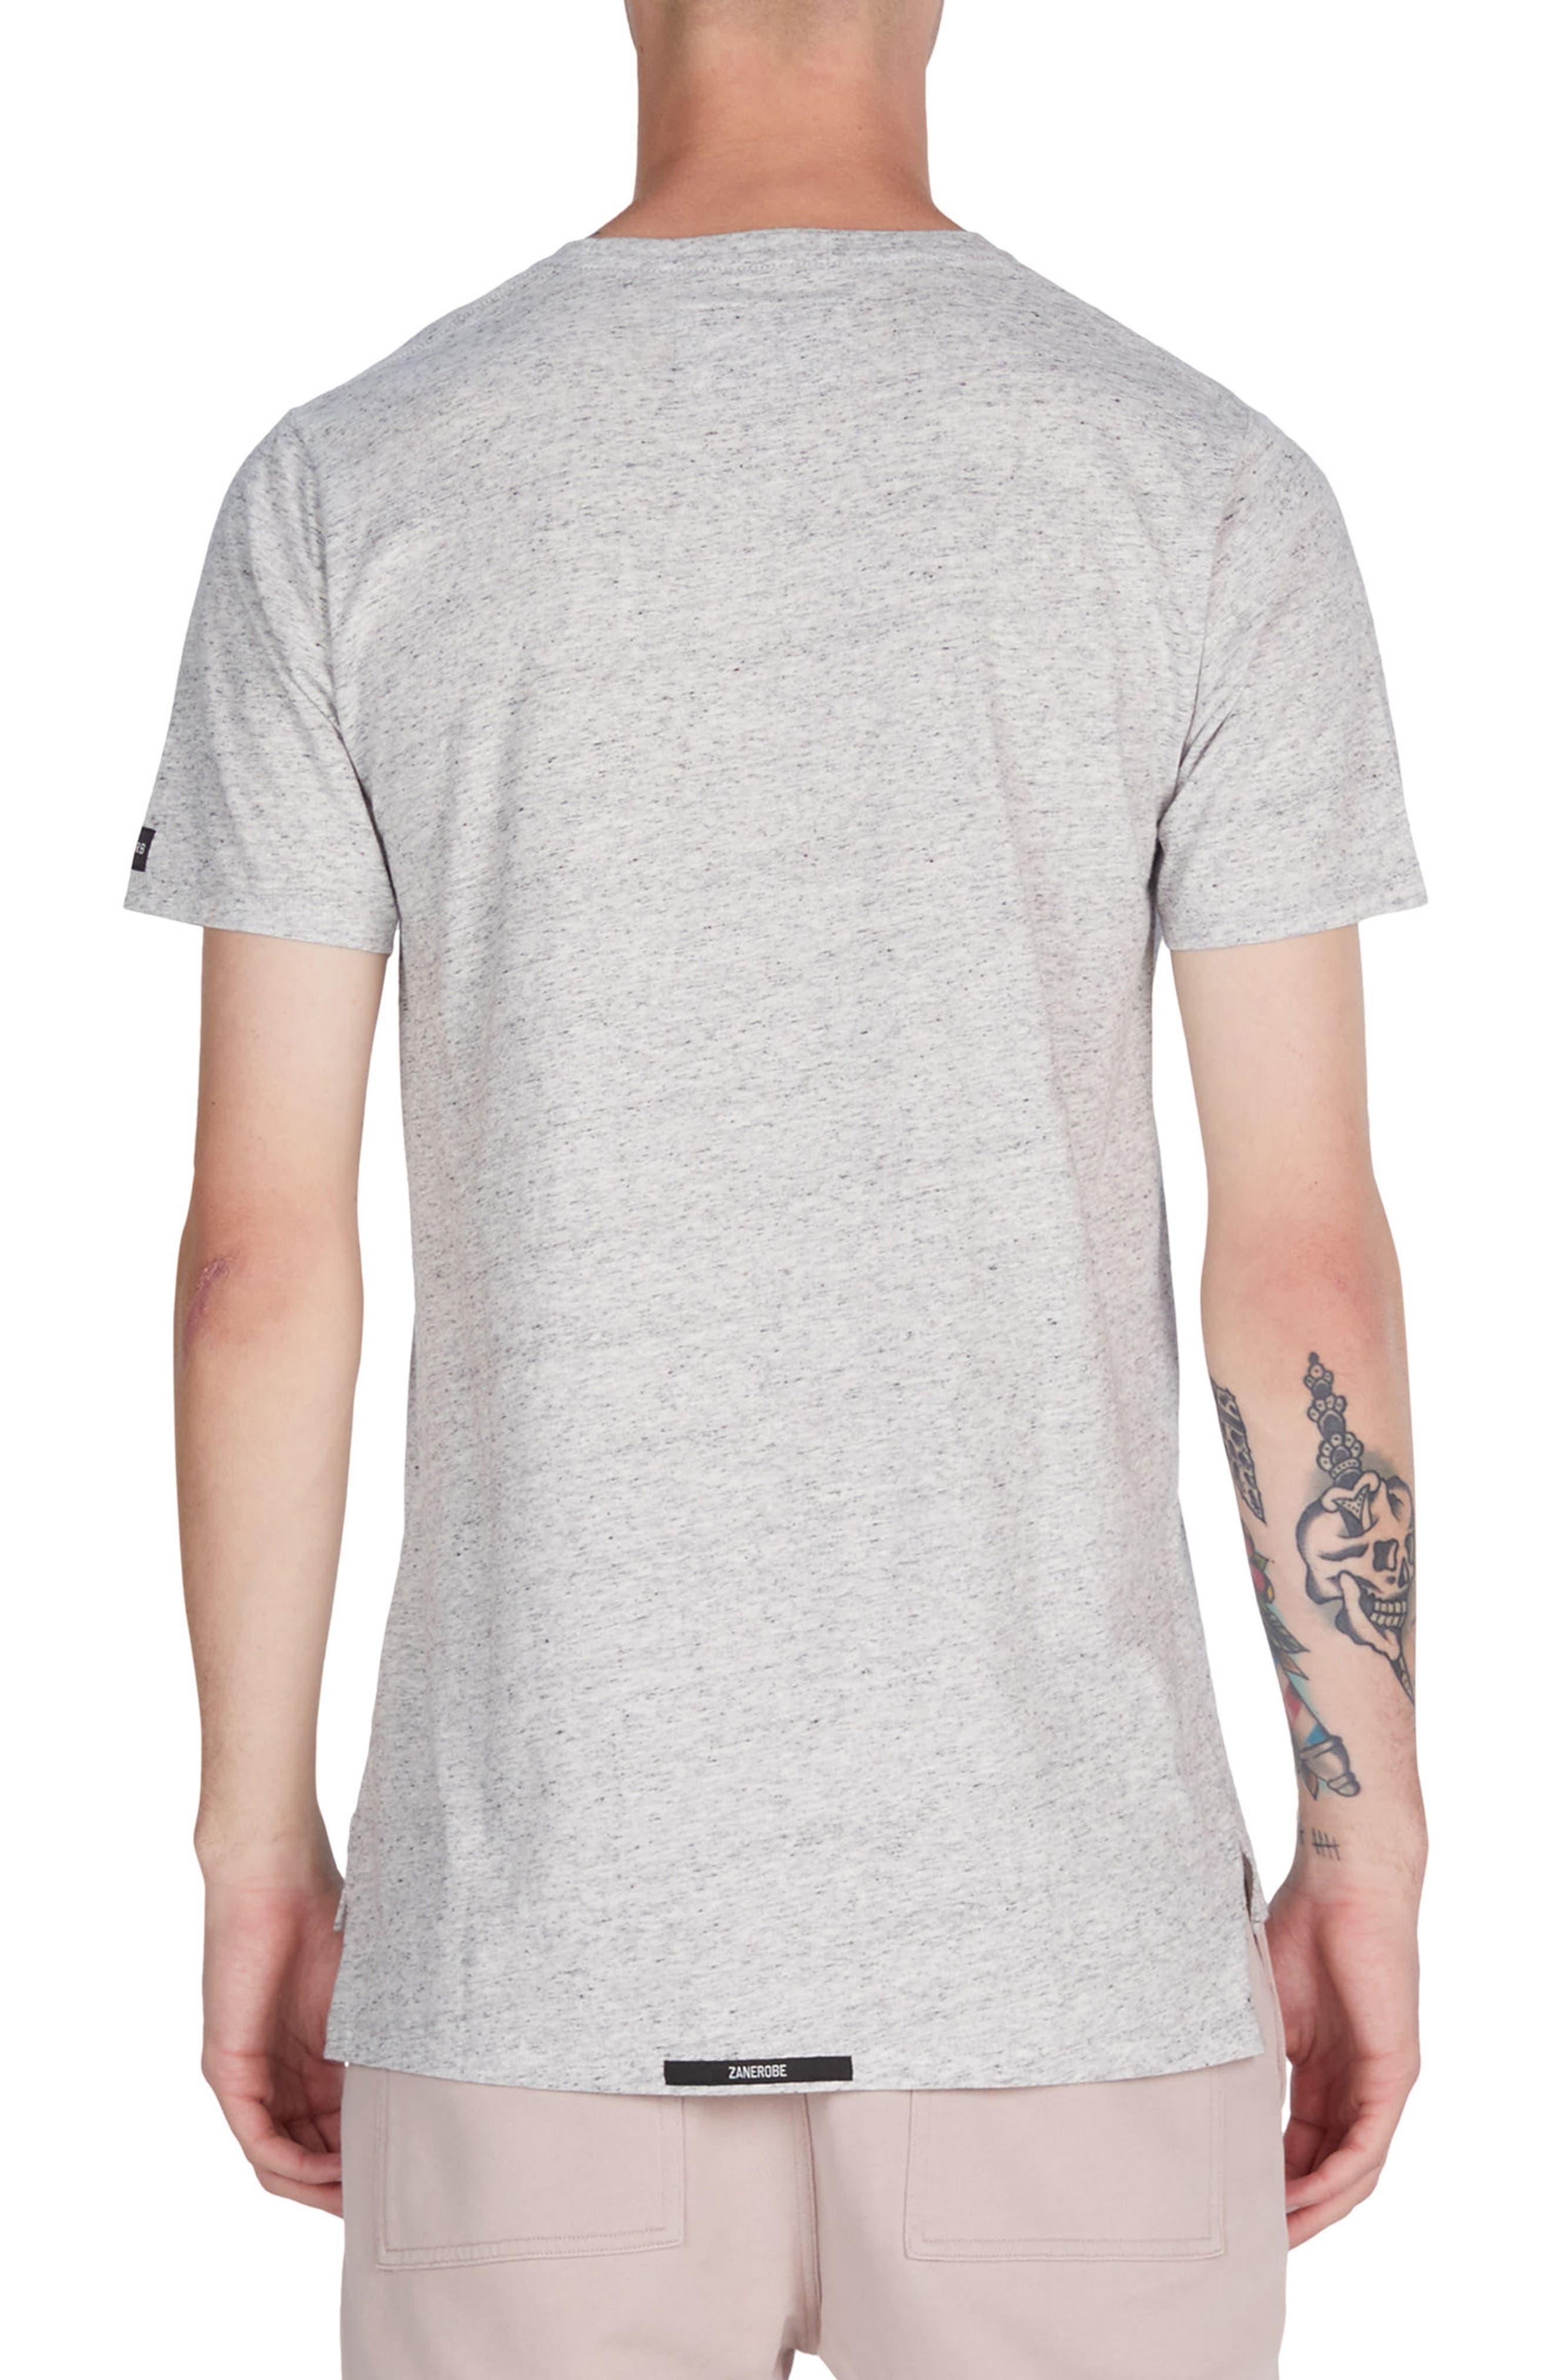 Flintlock T-Shirt,                             Alternate thumbnail 2, color,                             059